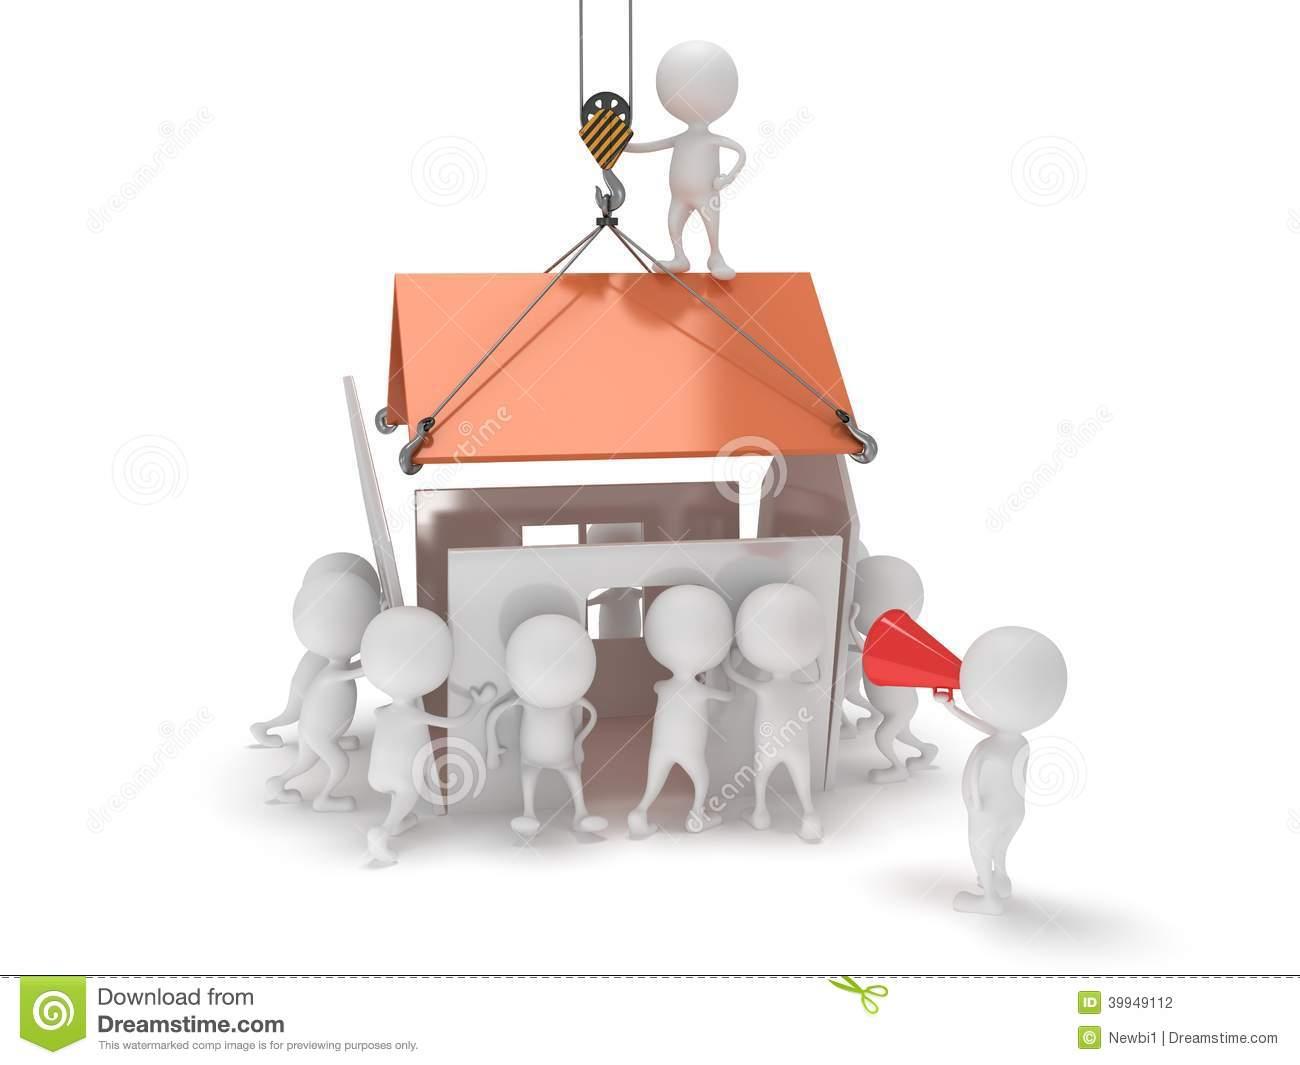 Haus bauen clipart graphic transparent stock Leute 3D Bauen Ein Haus Stock Abbildung - Bild: 40167532 graphic transparent stock